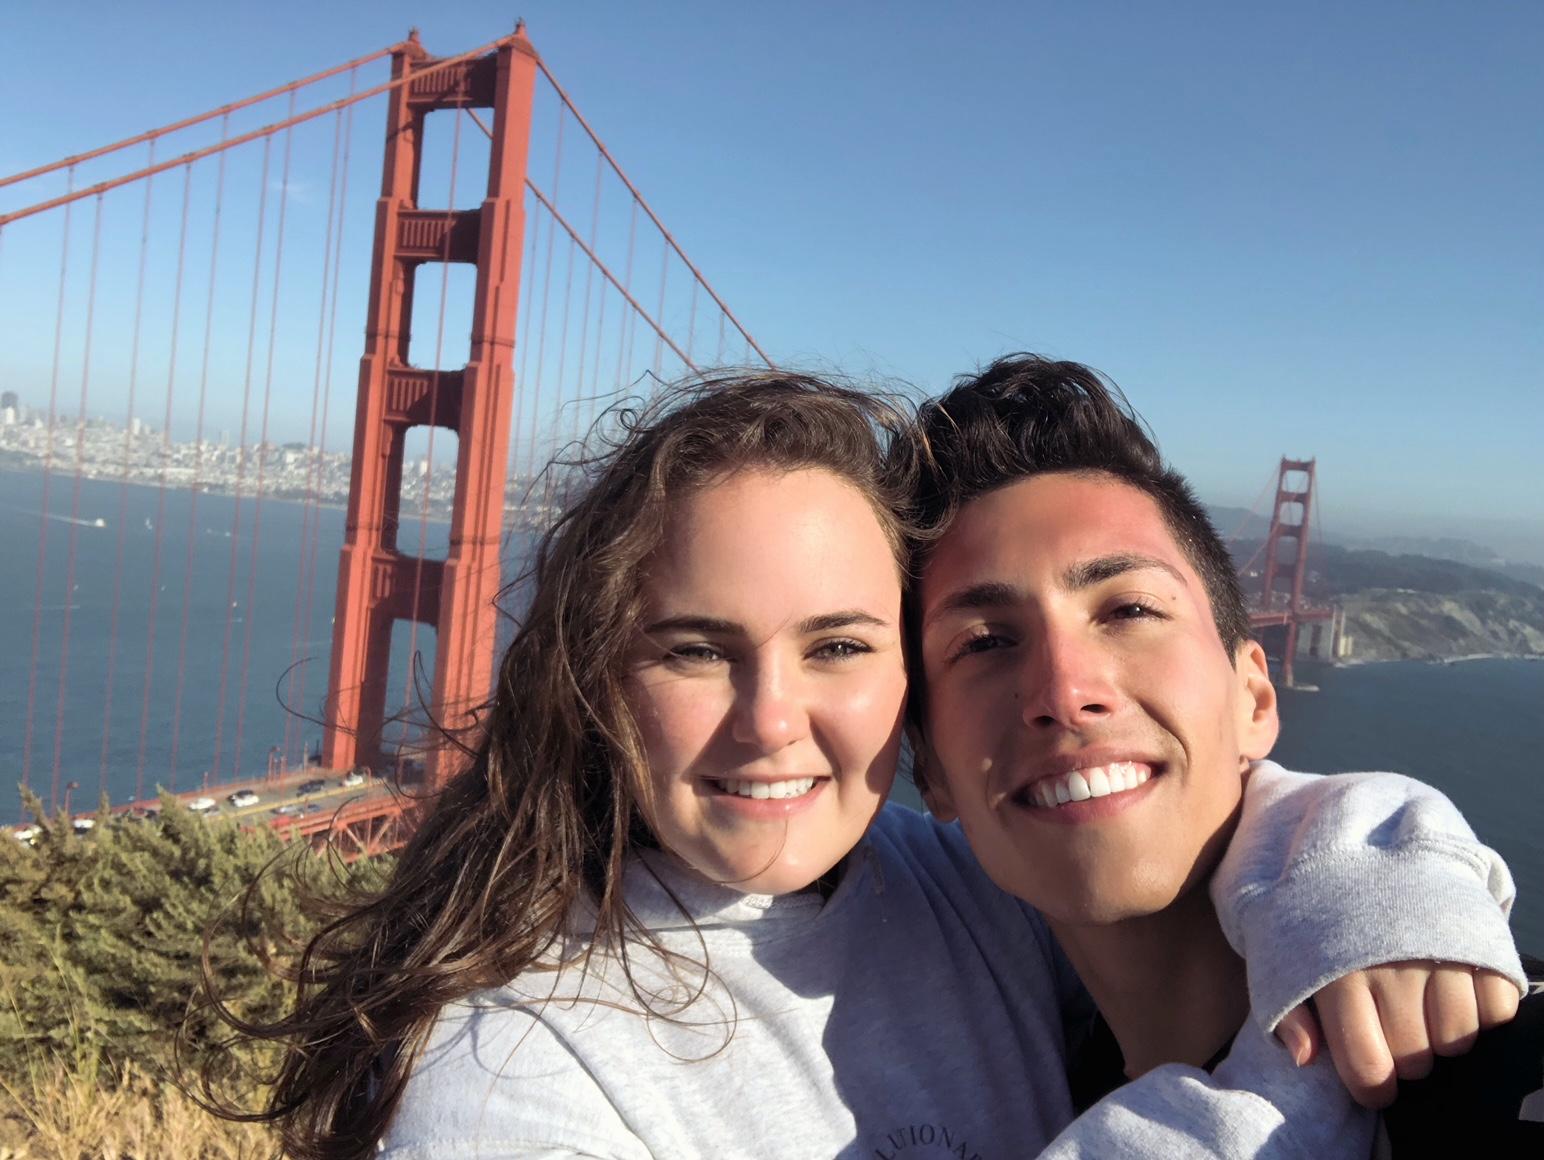 #HipNJ Visits San Francisco